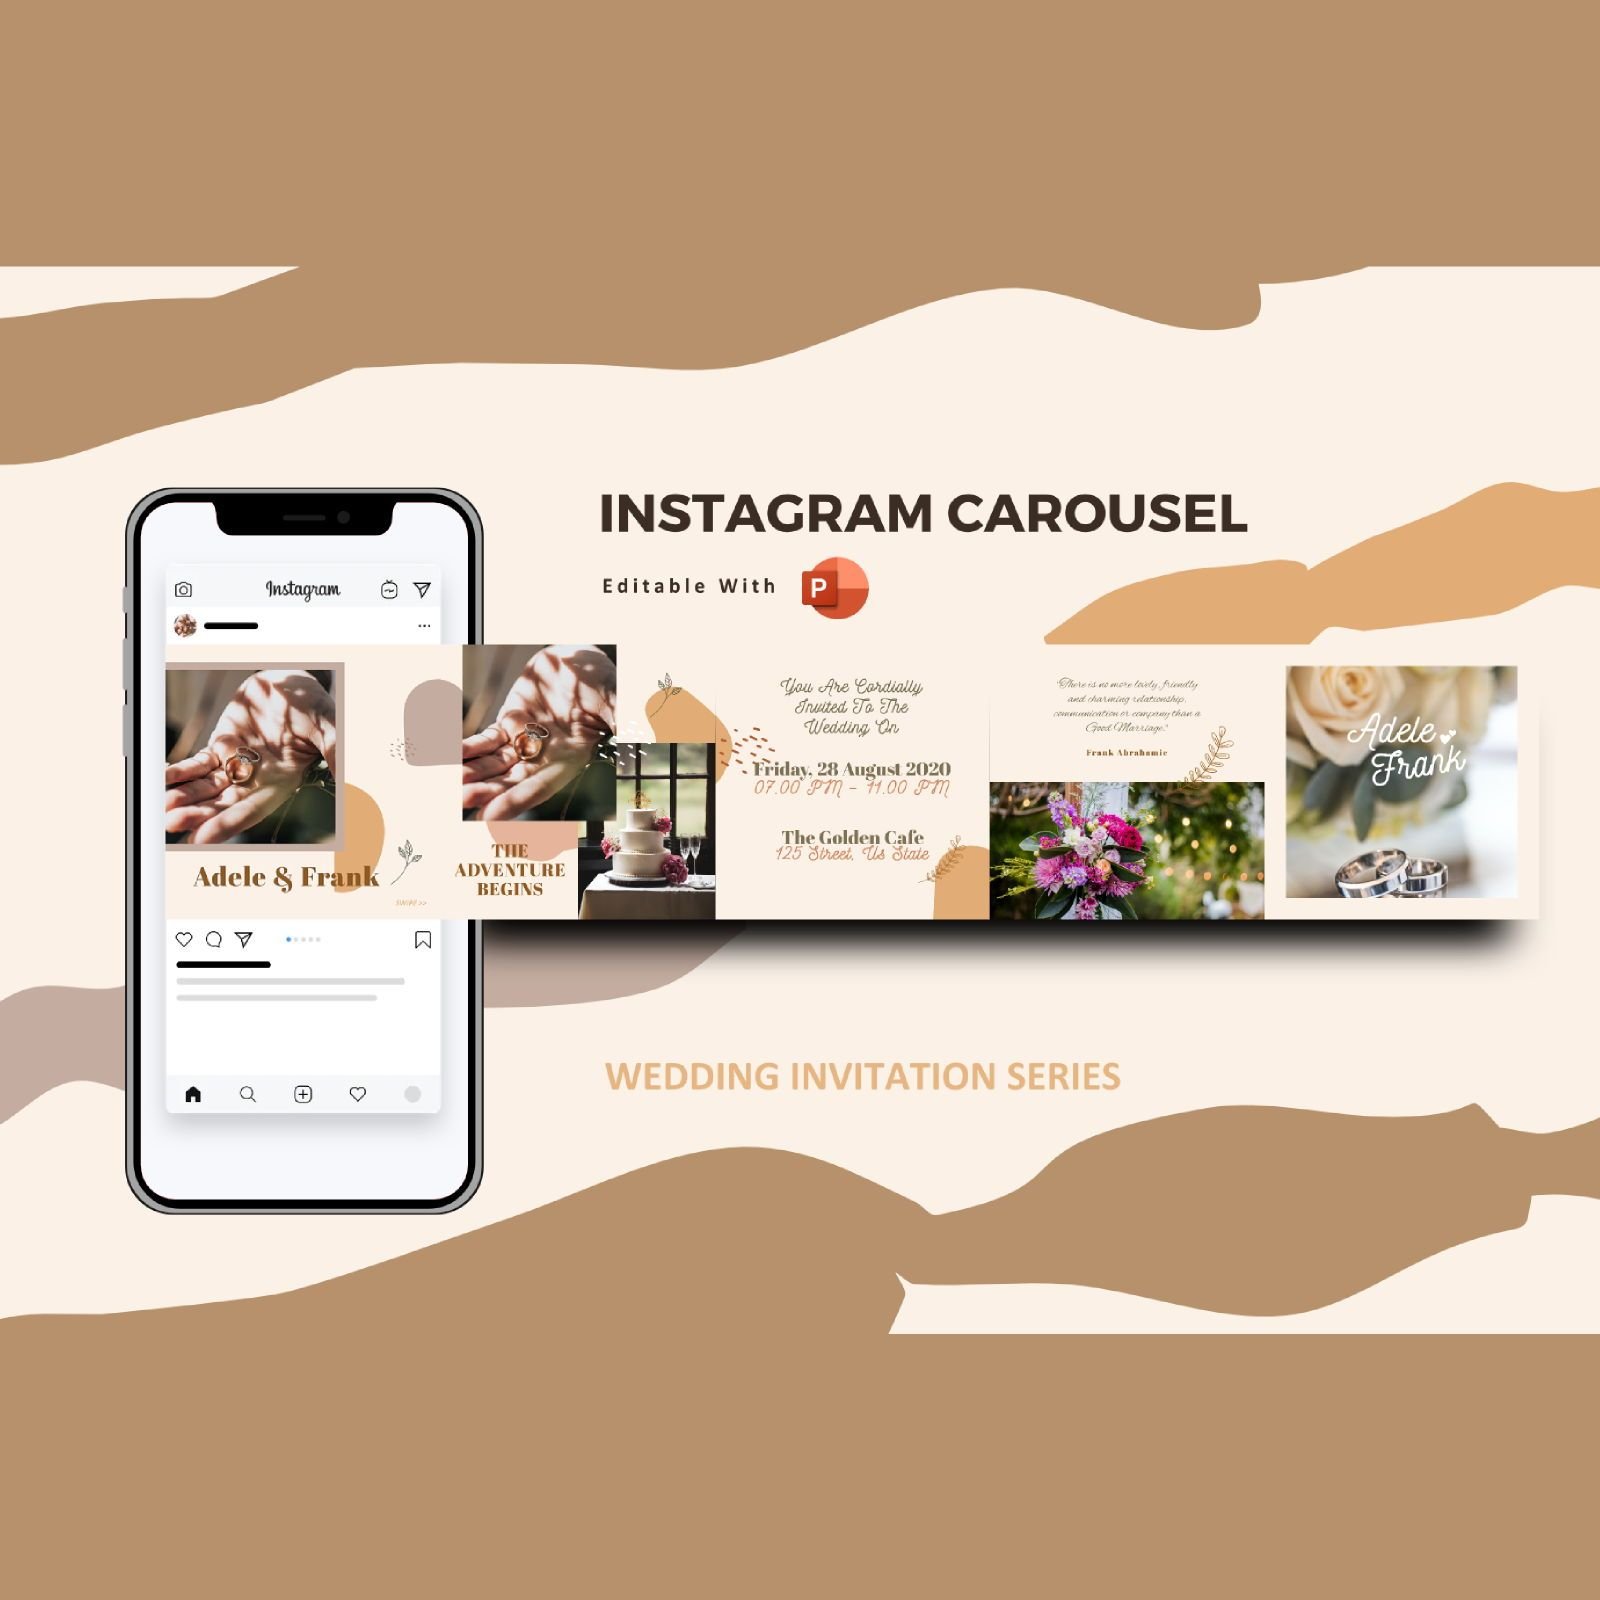 Wedding invitation instagram carousel powerpoint template, 07608, Presentation Templates — PoweredTemplate.com